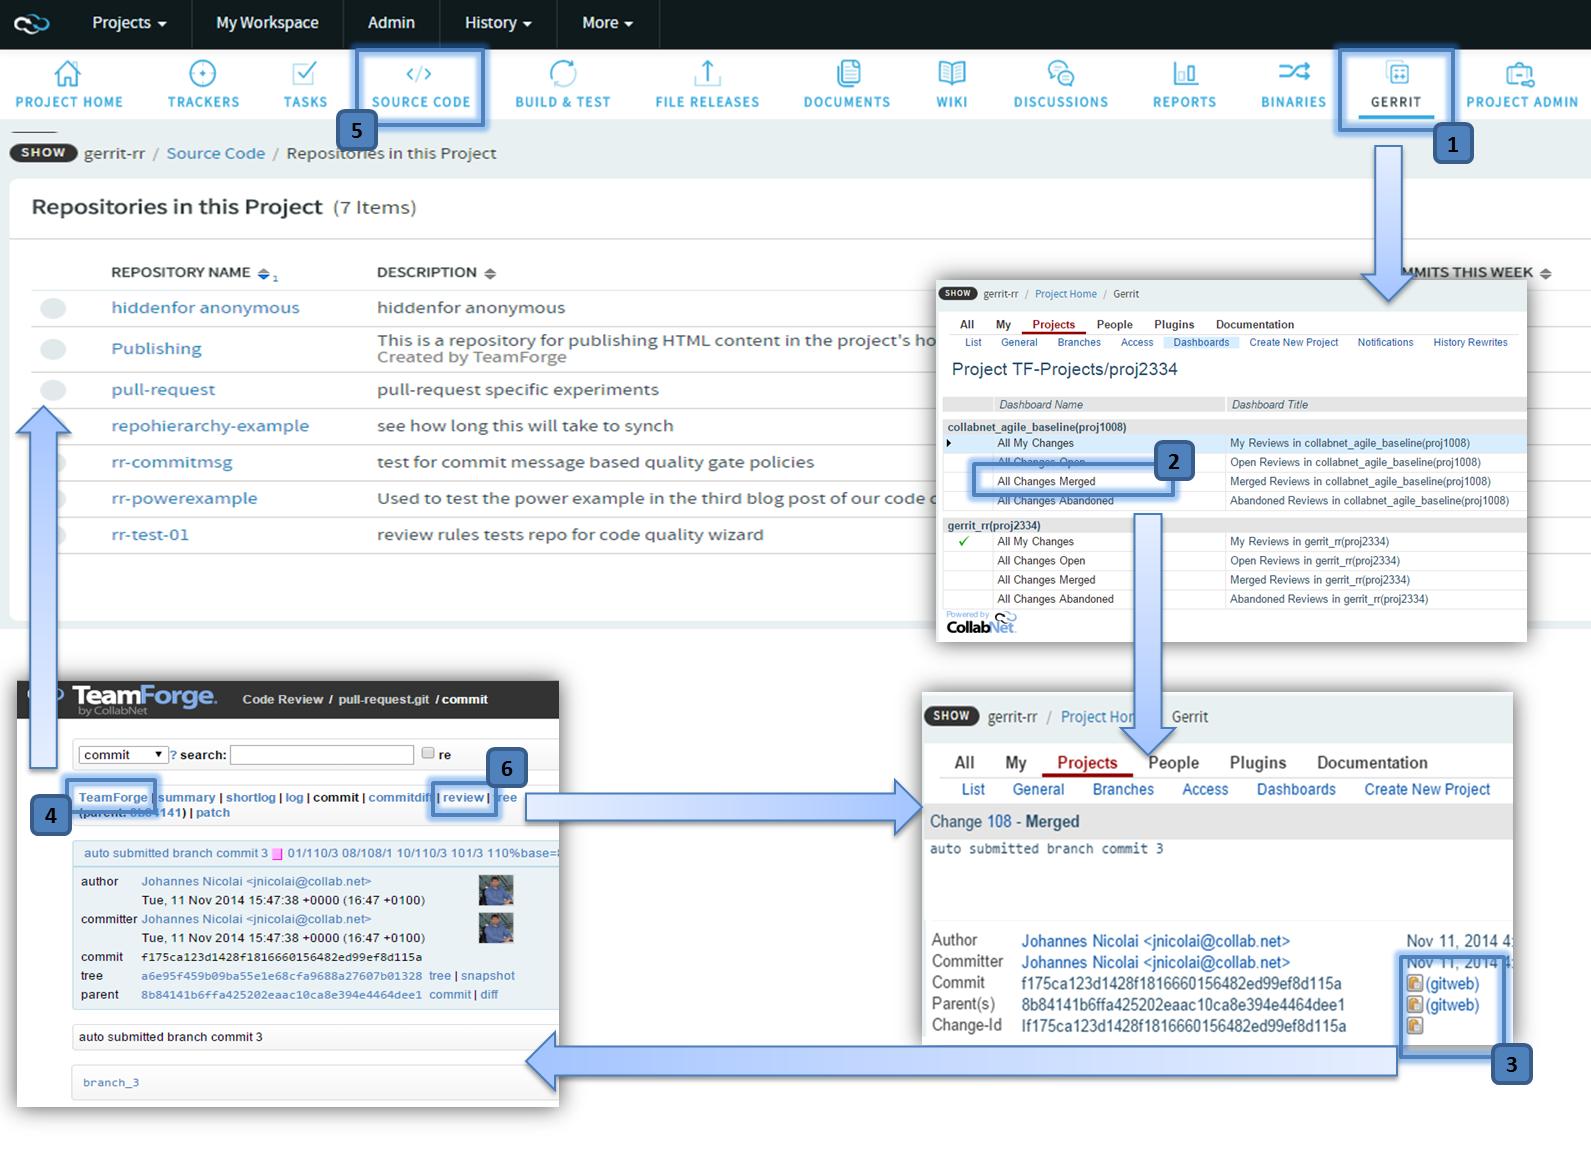 Navigation Flow between TeamForge work bench, Gerrit and GitWeb